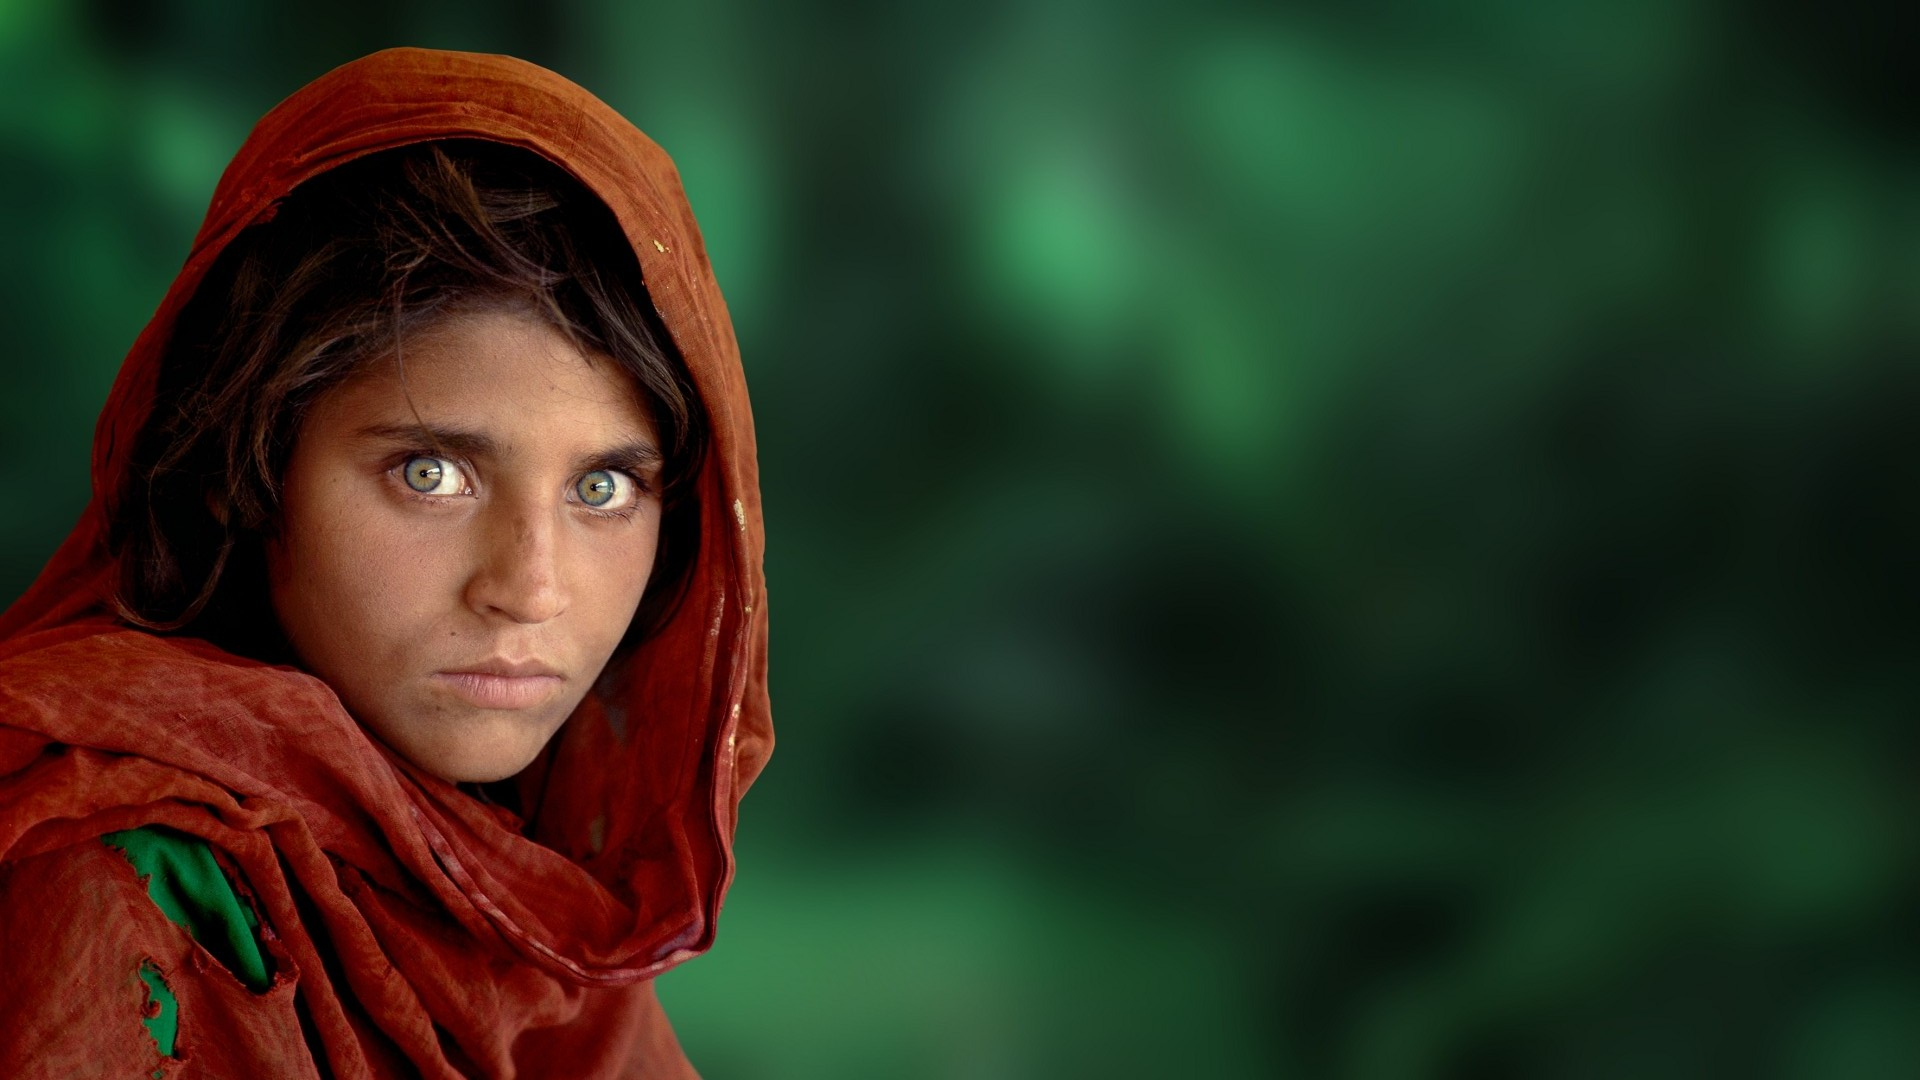 'Afgan kızı' gözaltına alındı